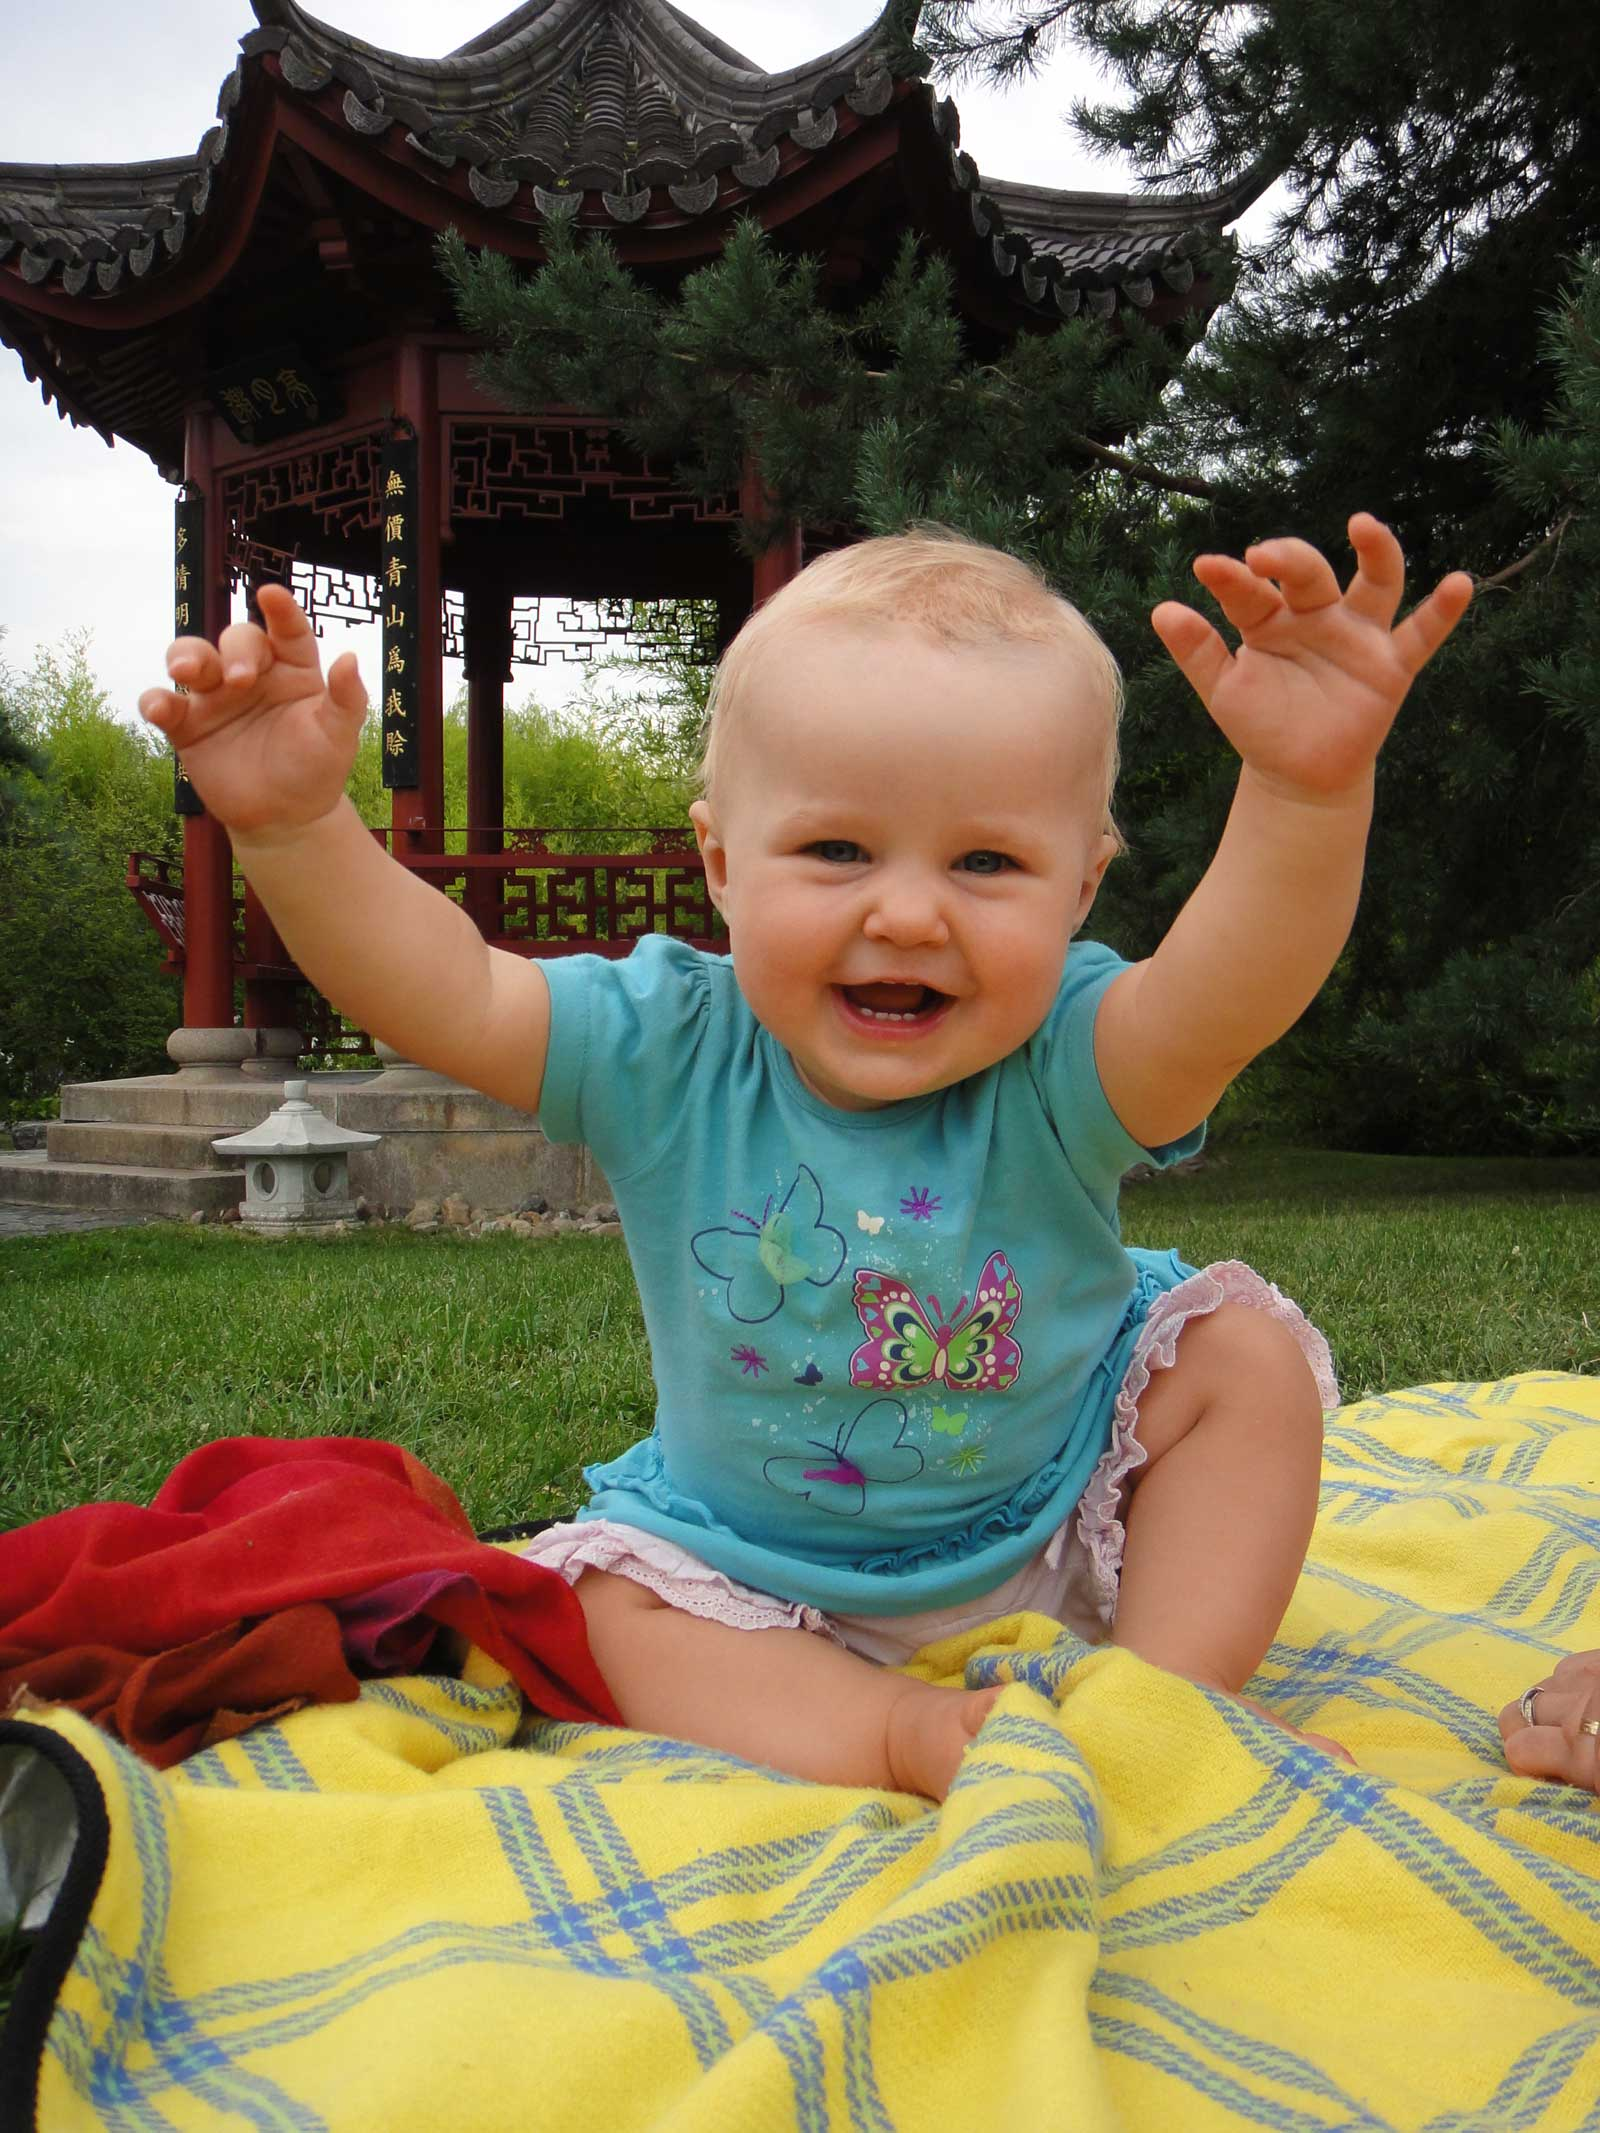 Beseelte Momente - Taufkind Segensfeier